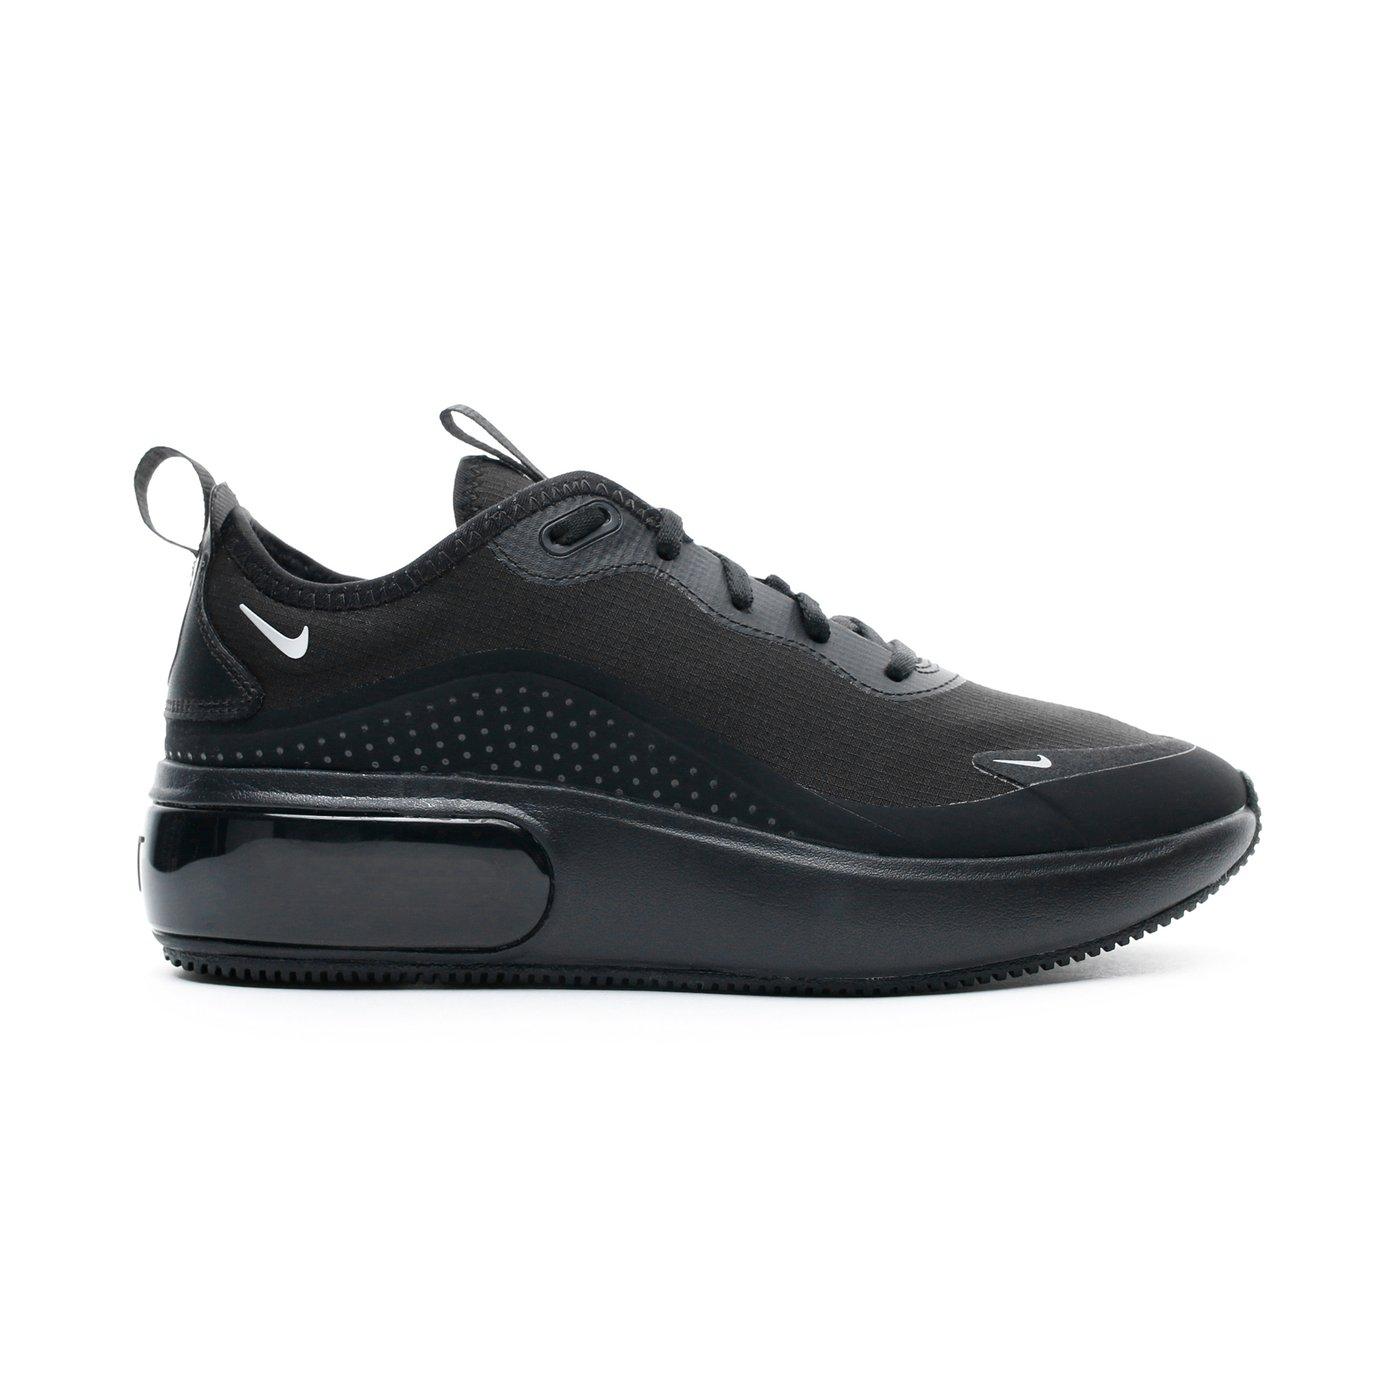 Nike Air Max Dia Siyah Kadin Spor Ayakkabi Kadin Spor Ayakkabi Sneaker 3472360 Superstep